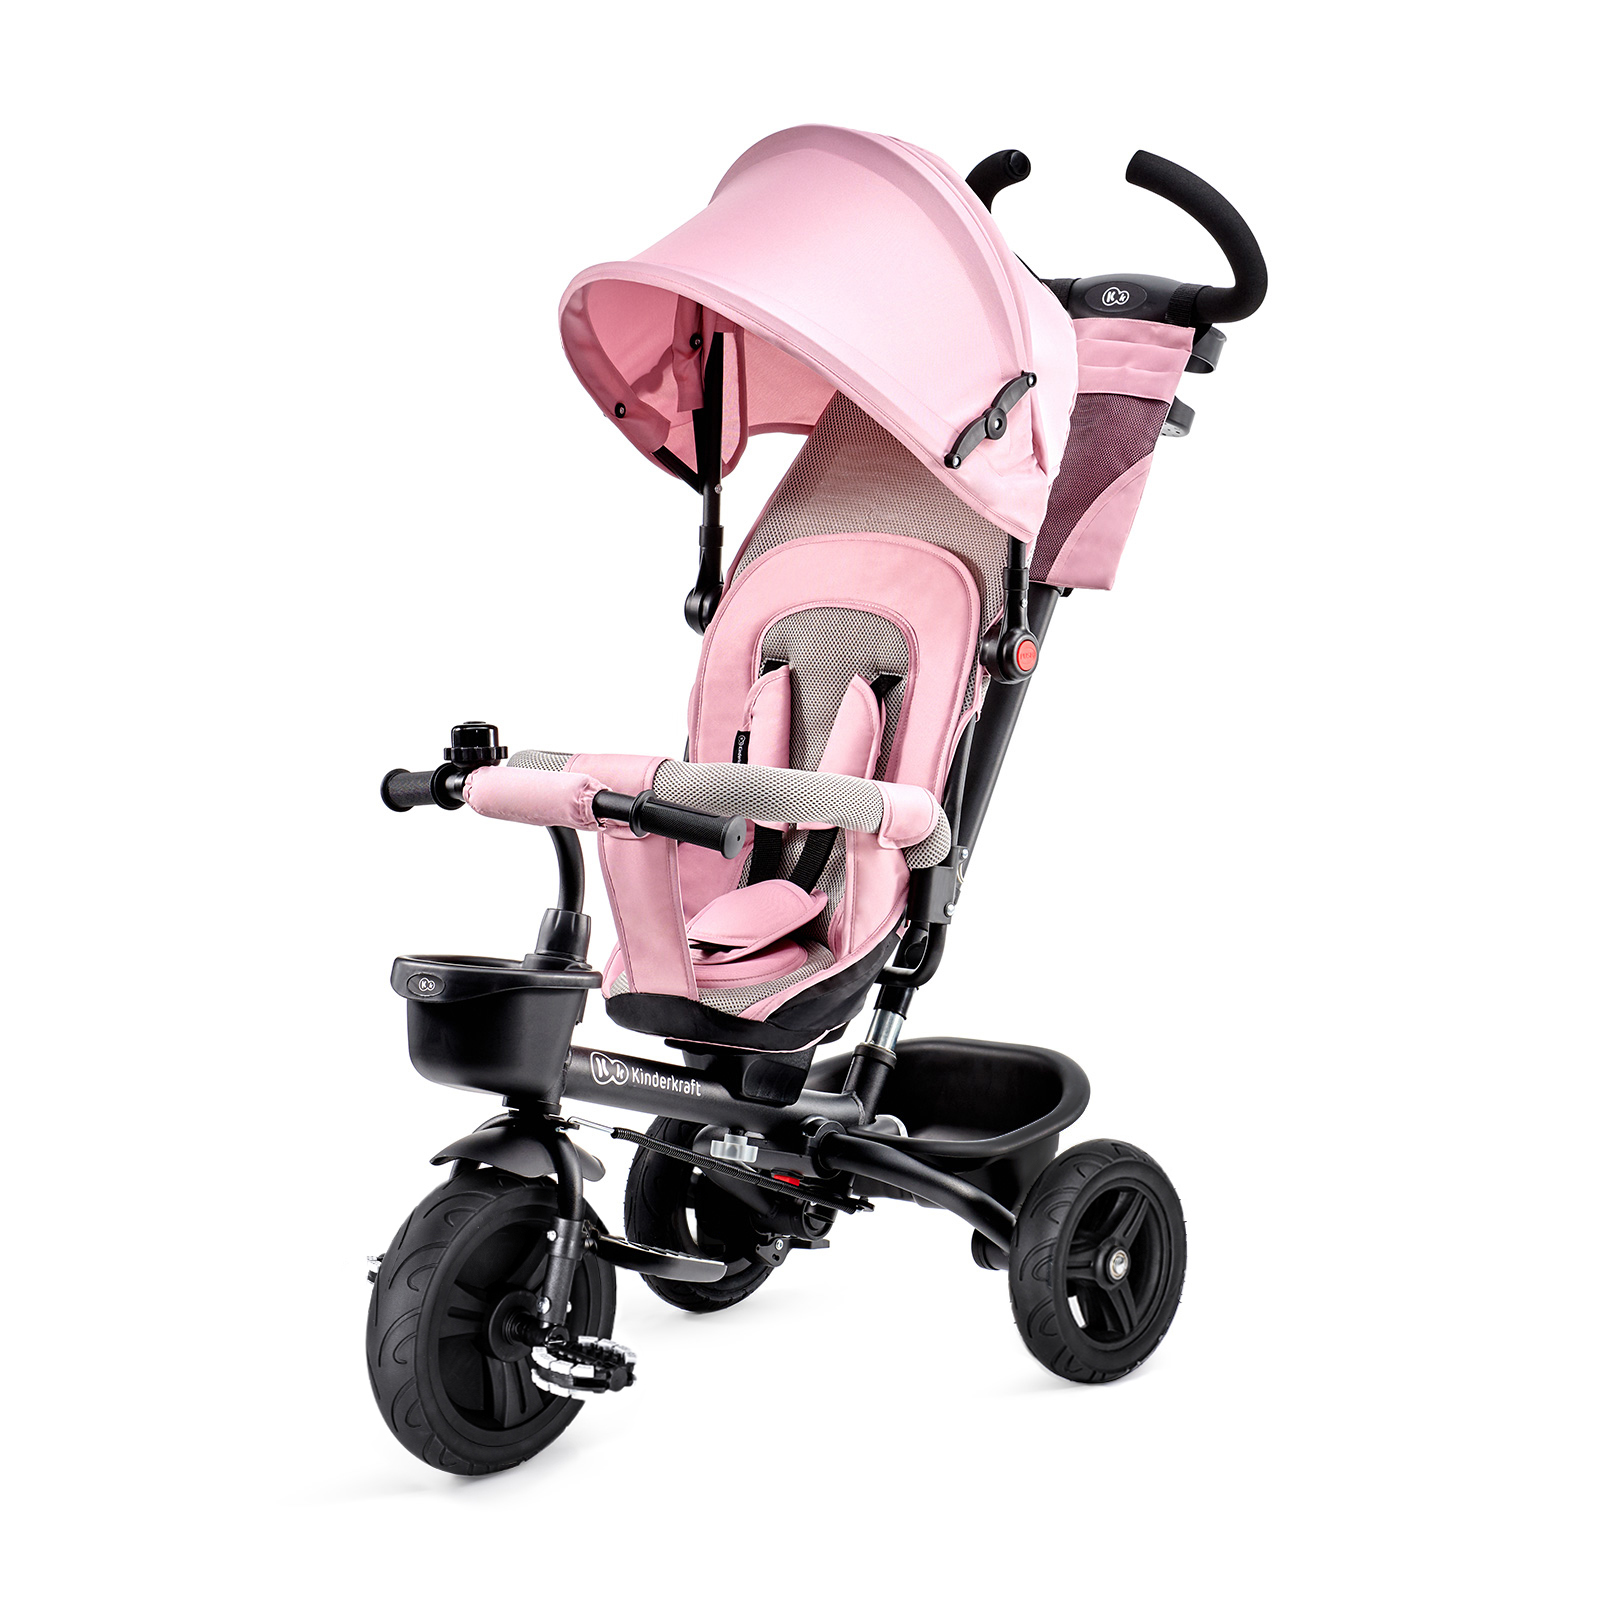 Trojkolka Aveo Pink Kinderkraft 2019